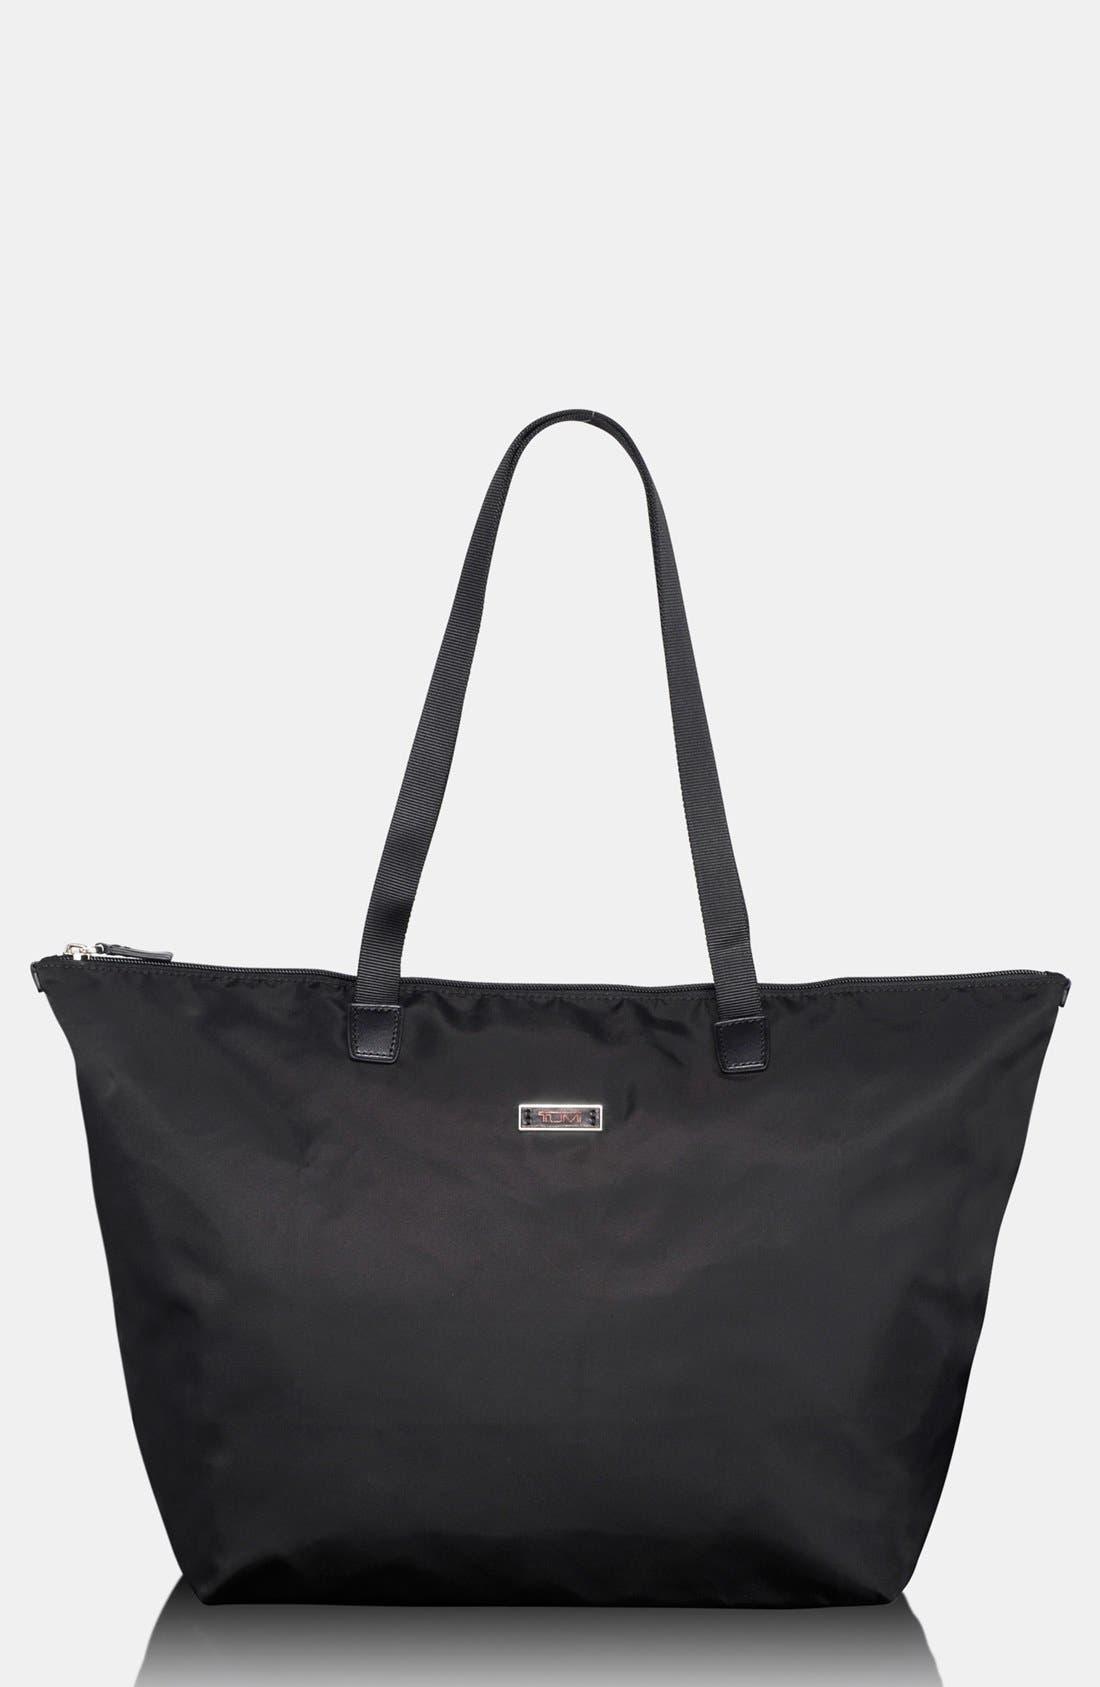 Main Image - Tumi 'Just in Case' Shopper